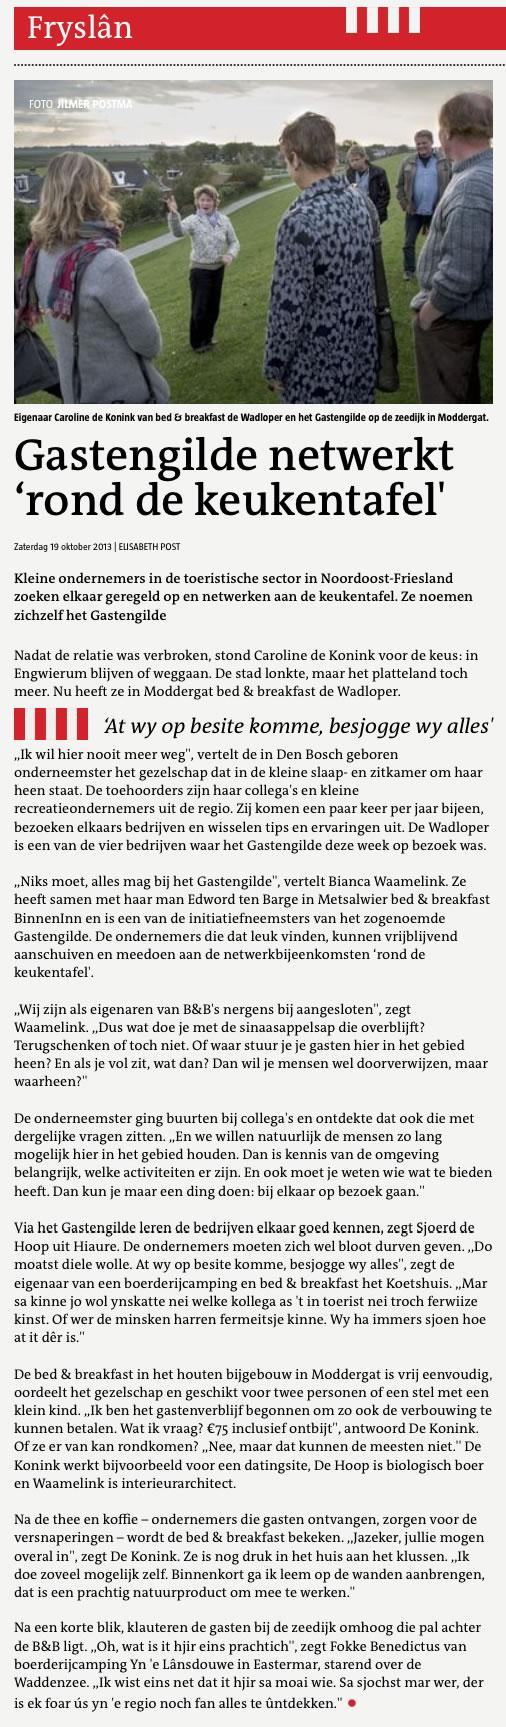 Artikel in de Leeuwarder Courant